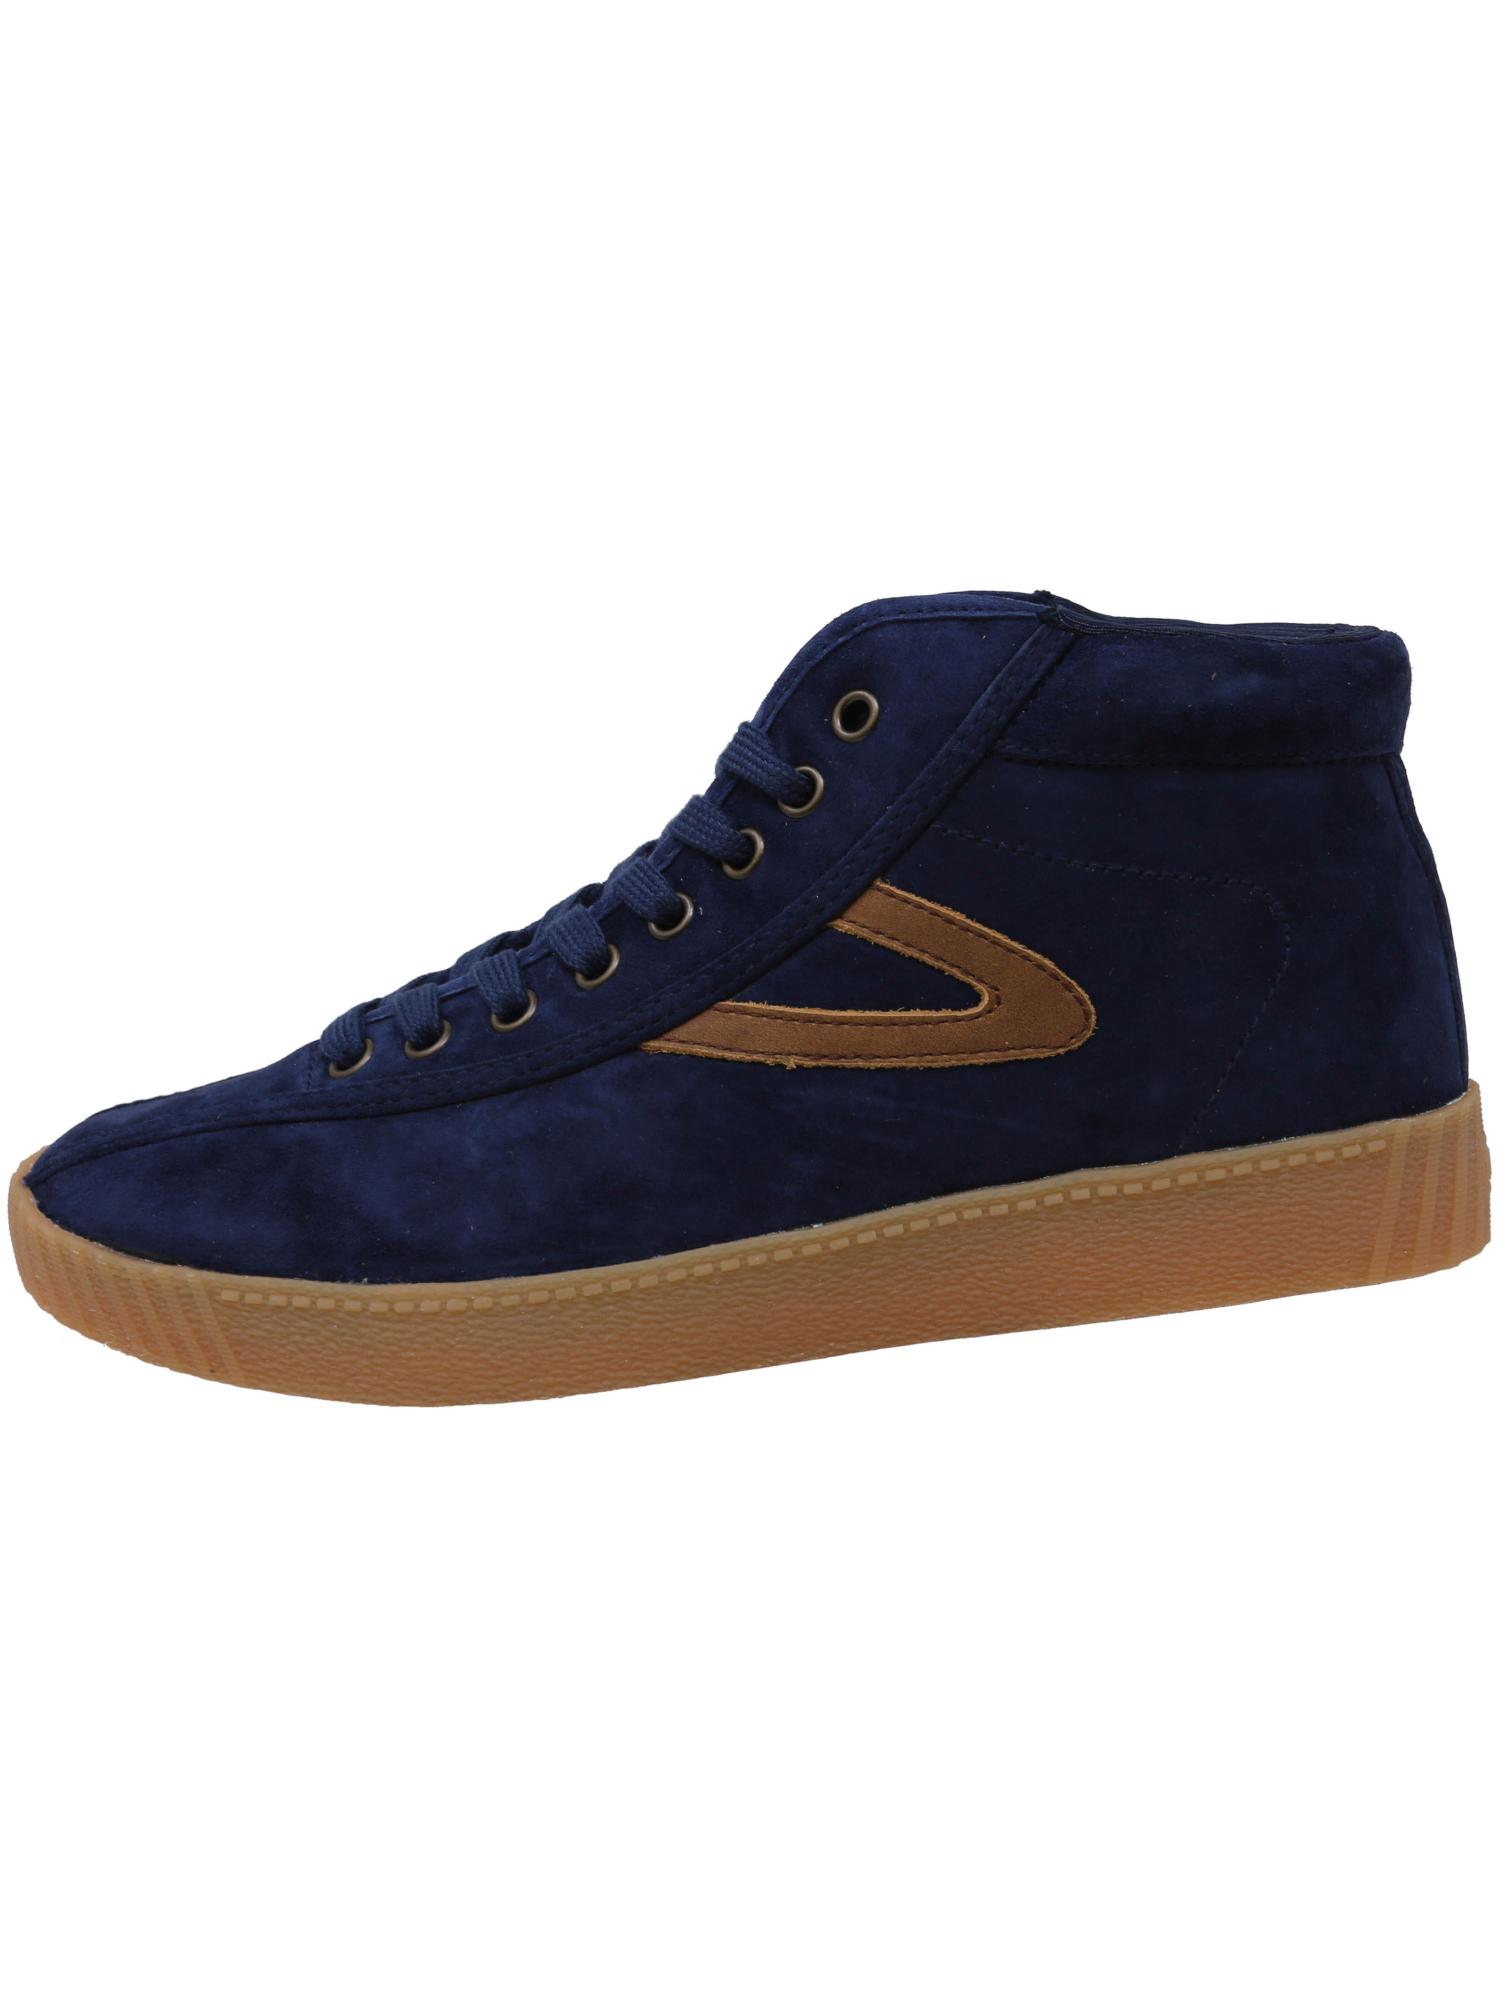 718e6640e95b ... Picture 2 of 3  Picture 3 of 3. Tretorn Men s Nylite Hi 7 Suede High-Top  Fashion Sneaker